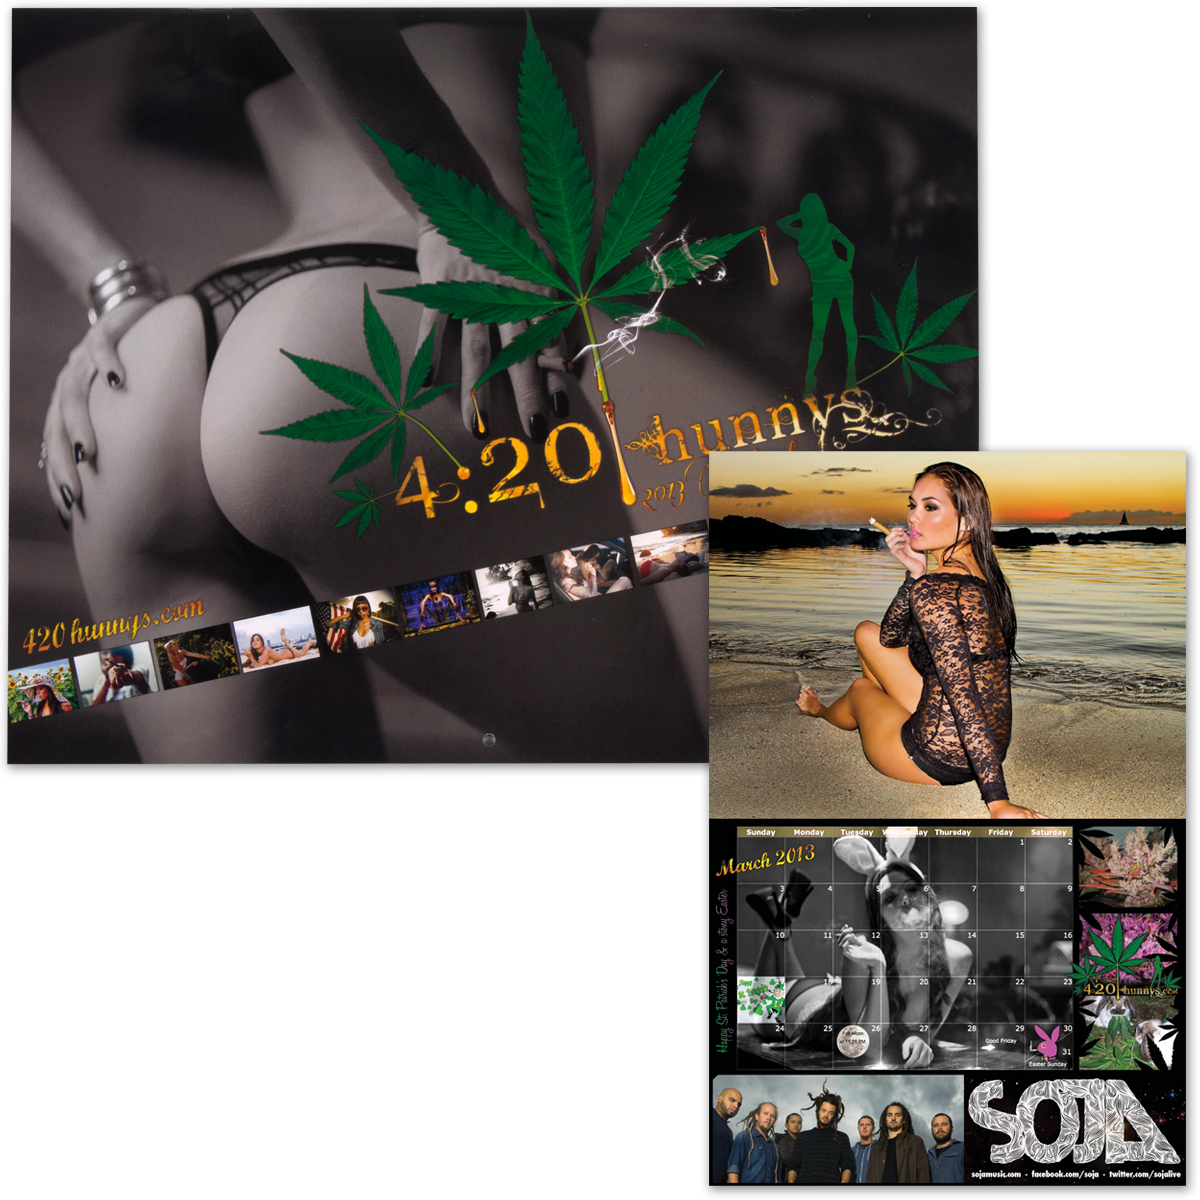 SOJA - 420 Hunnys 2013 Calendar